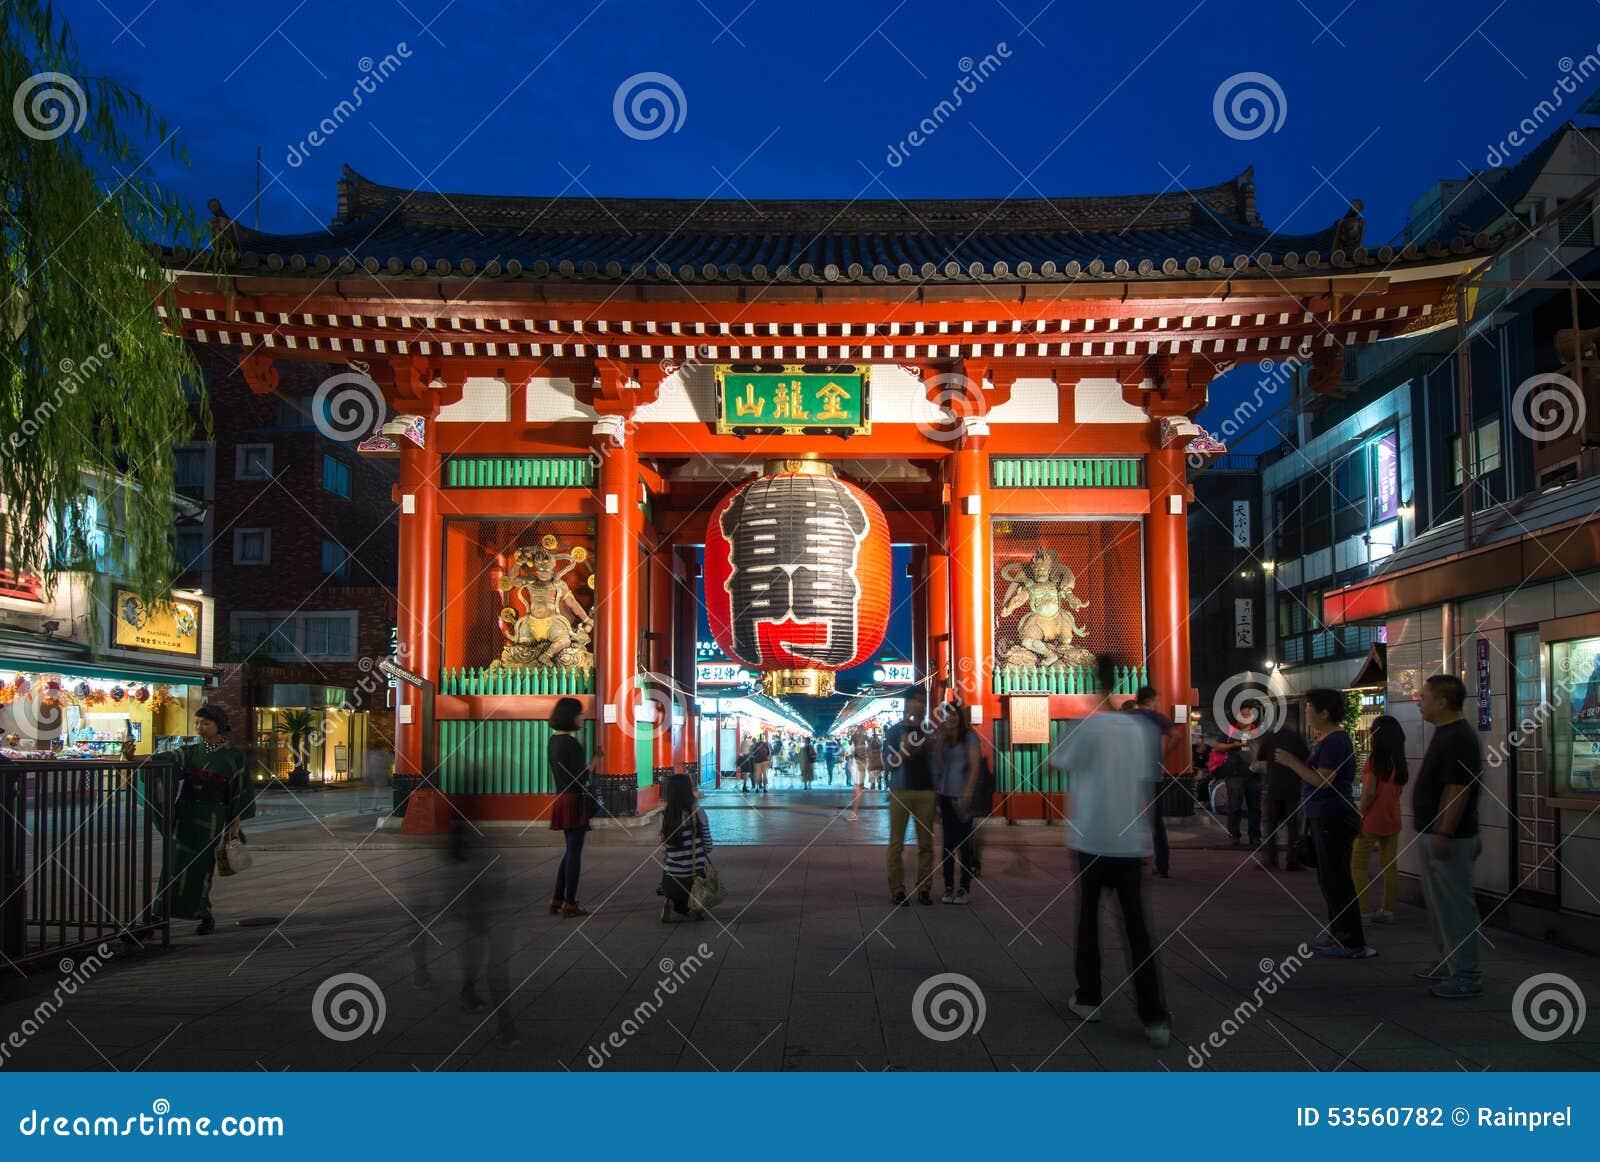 Kaminarimon Gate of the Asakusa Kannon Temple in Tokyo, Japan